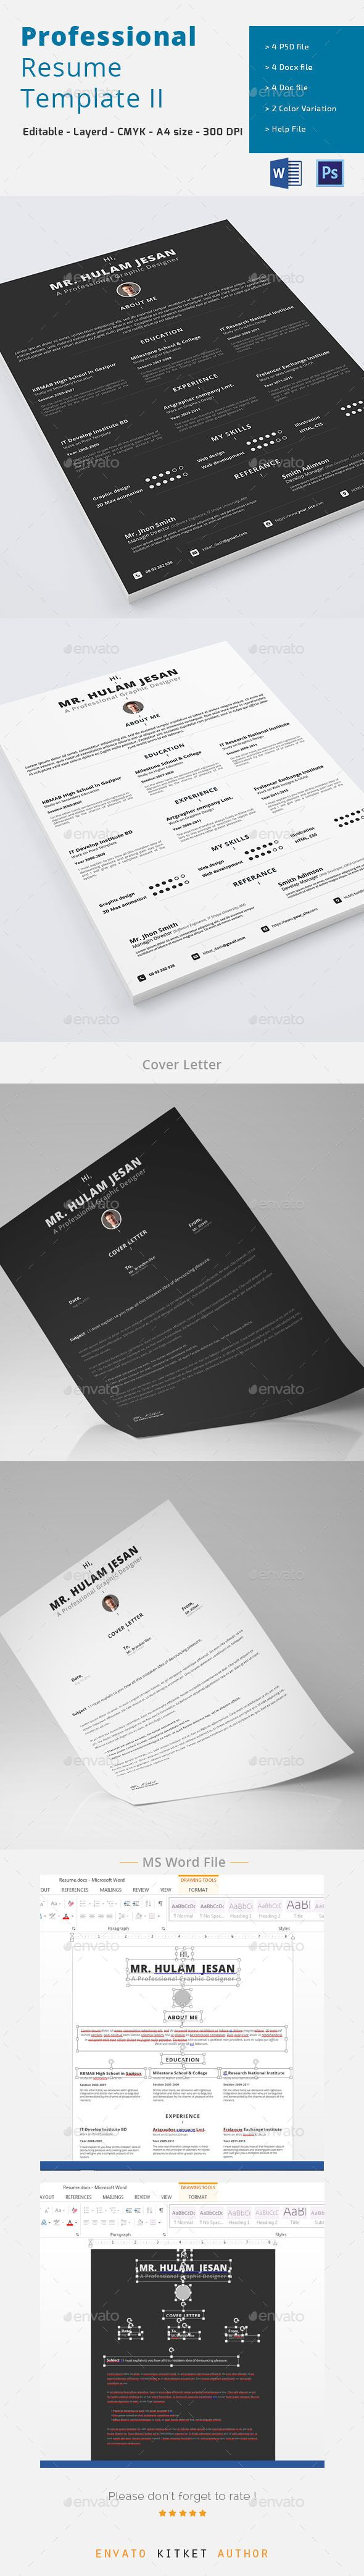 Professional Resume Template II 25 best Resume